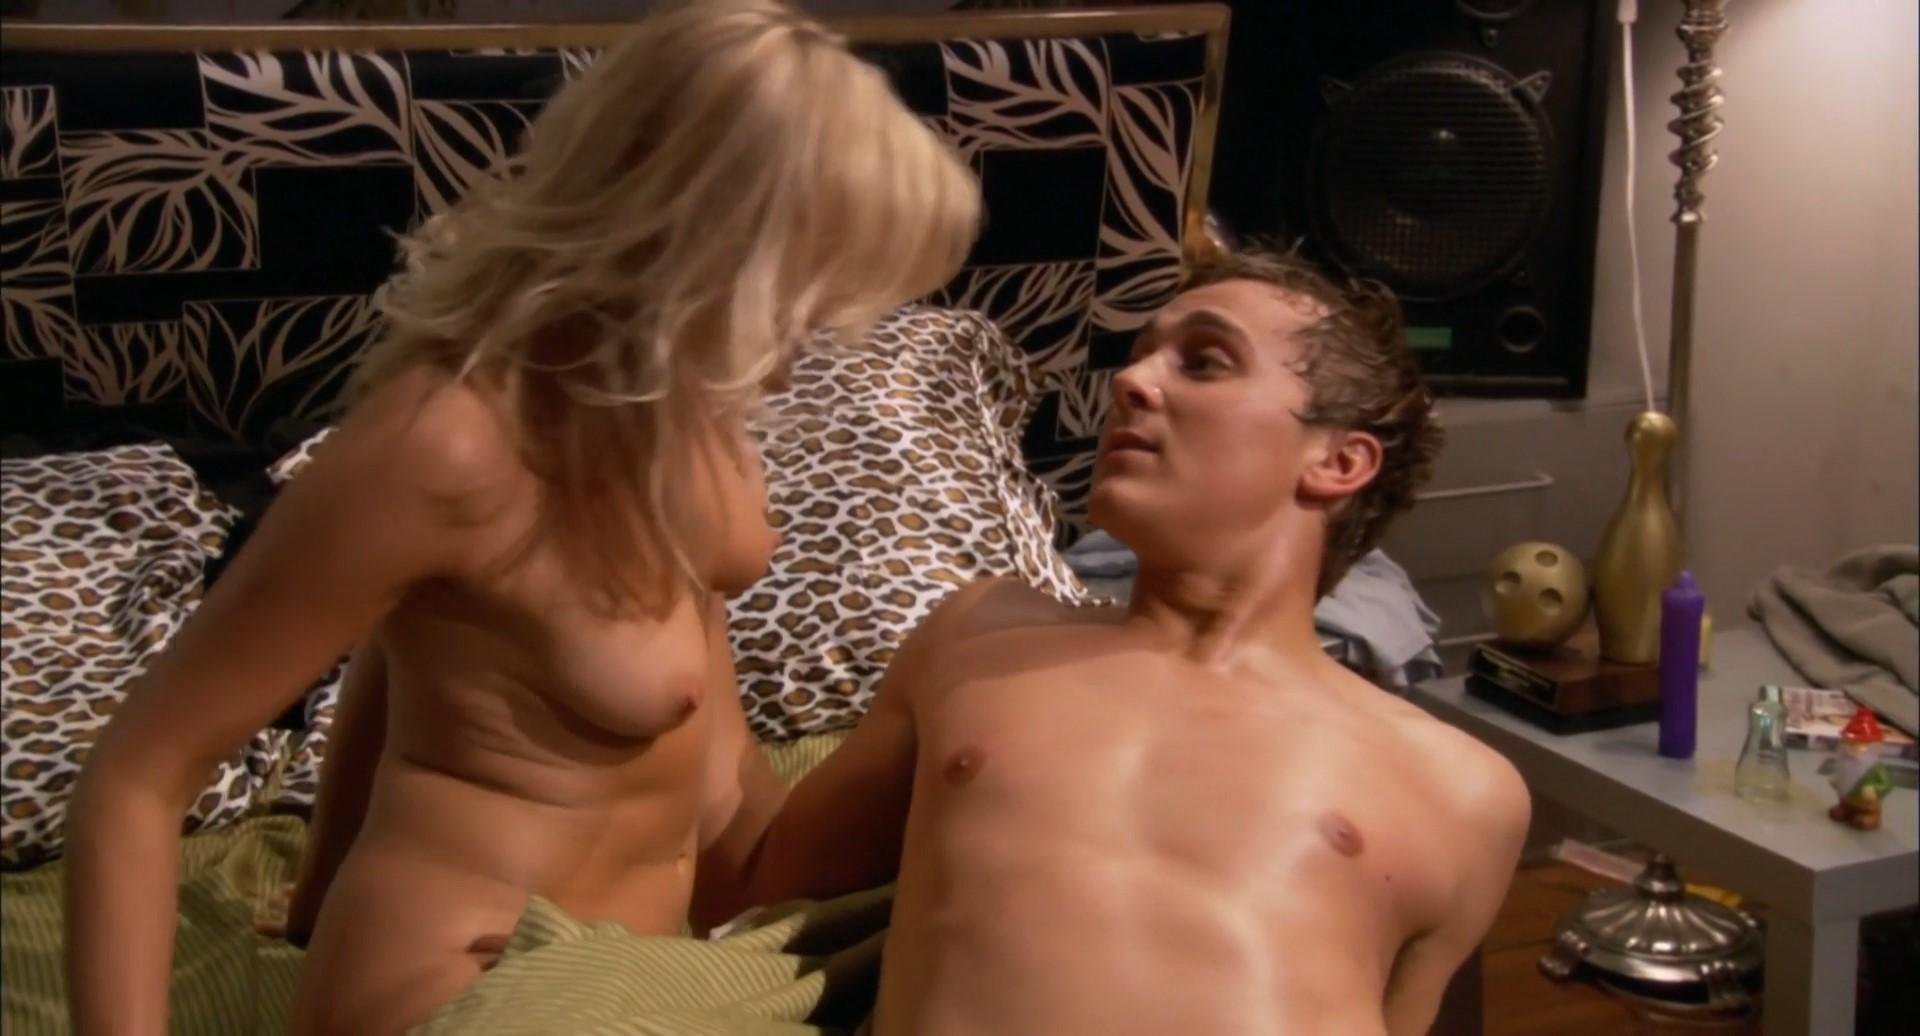 American Pie Presents Beta House Sex Scene watch online - ashleigh hubbard – american pie presents beta